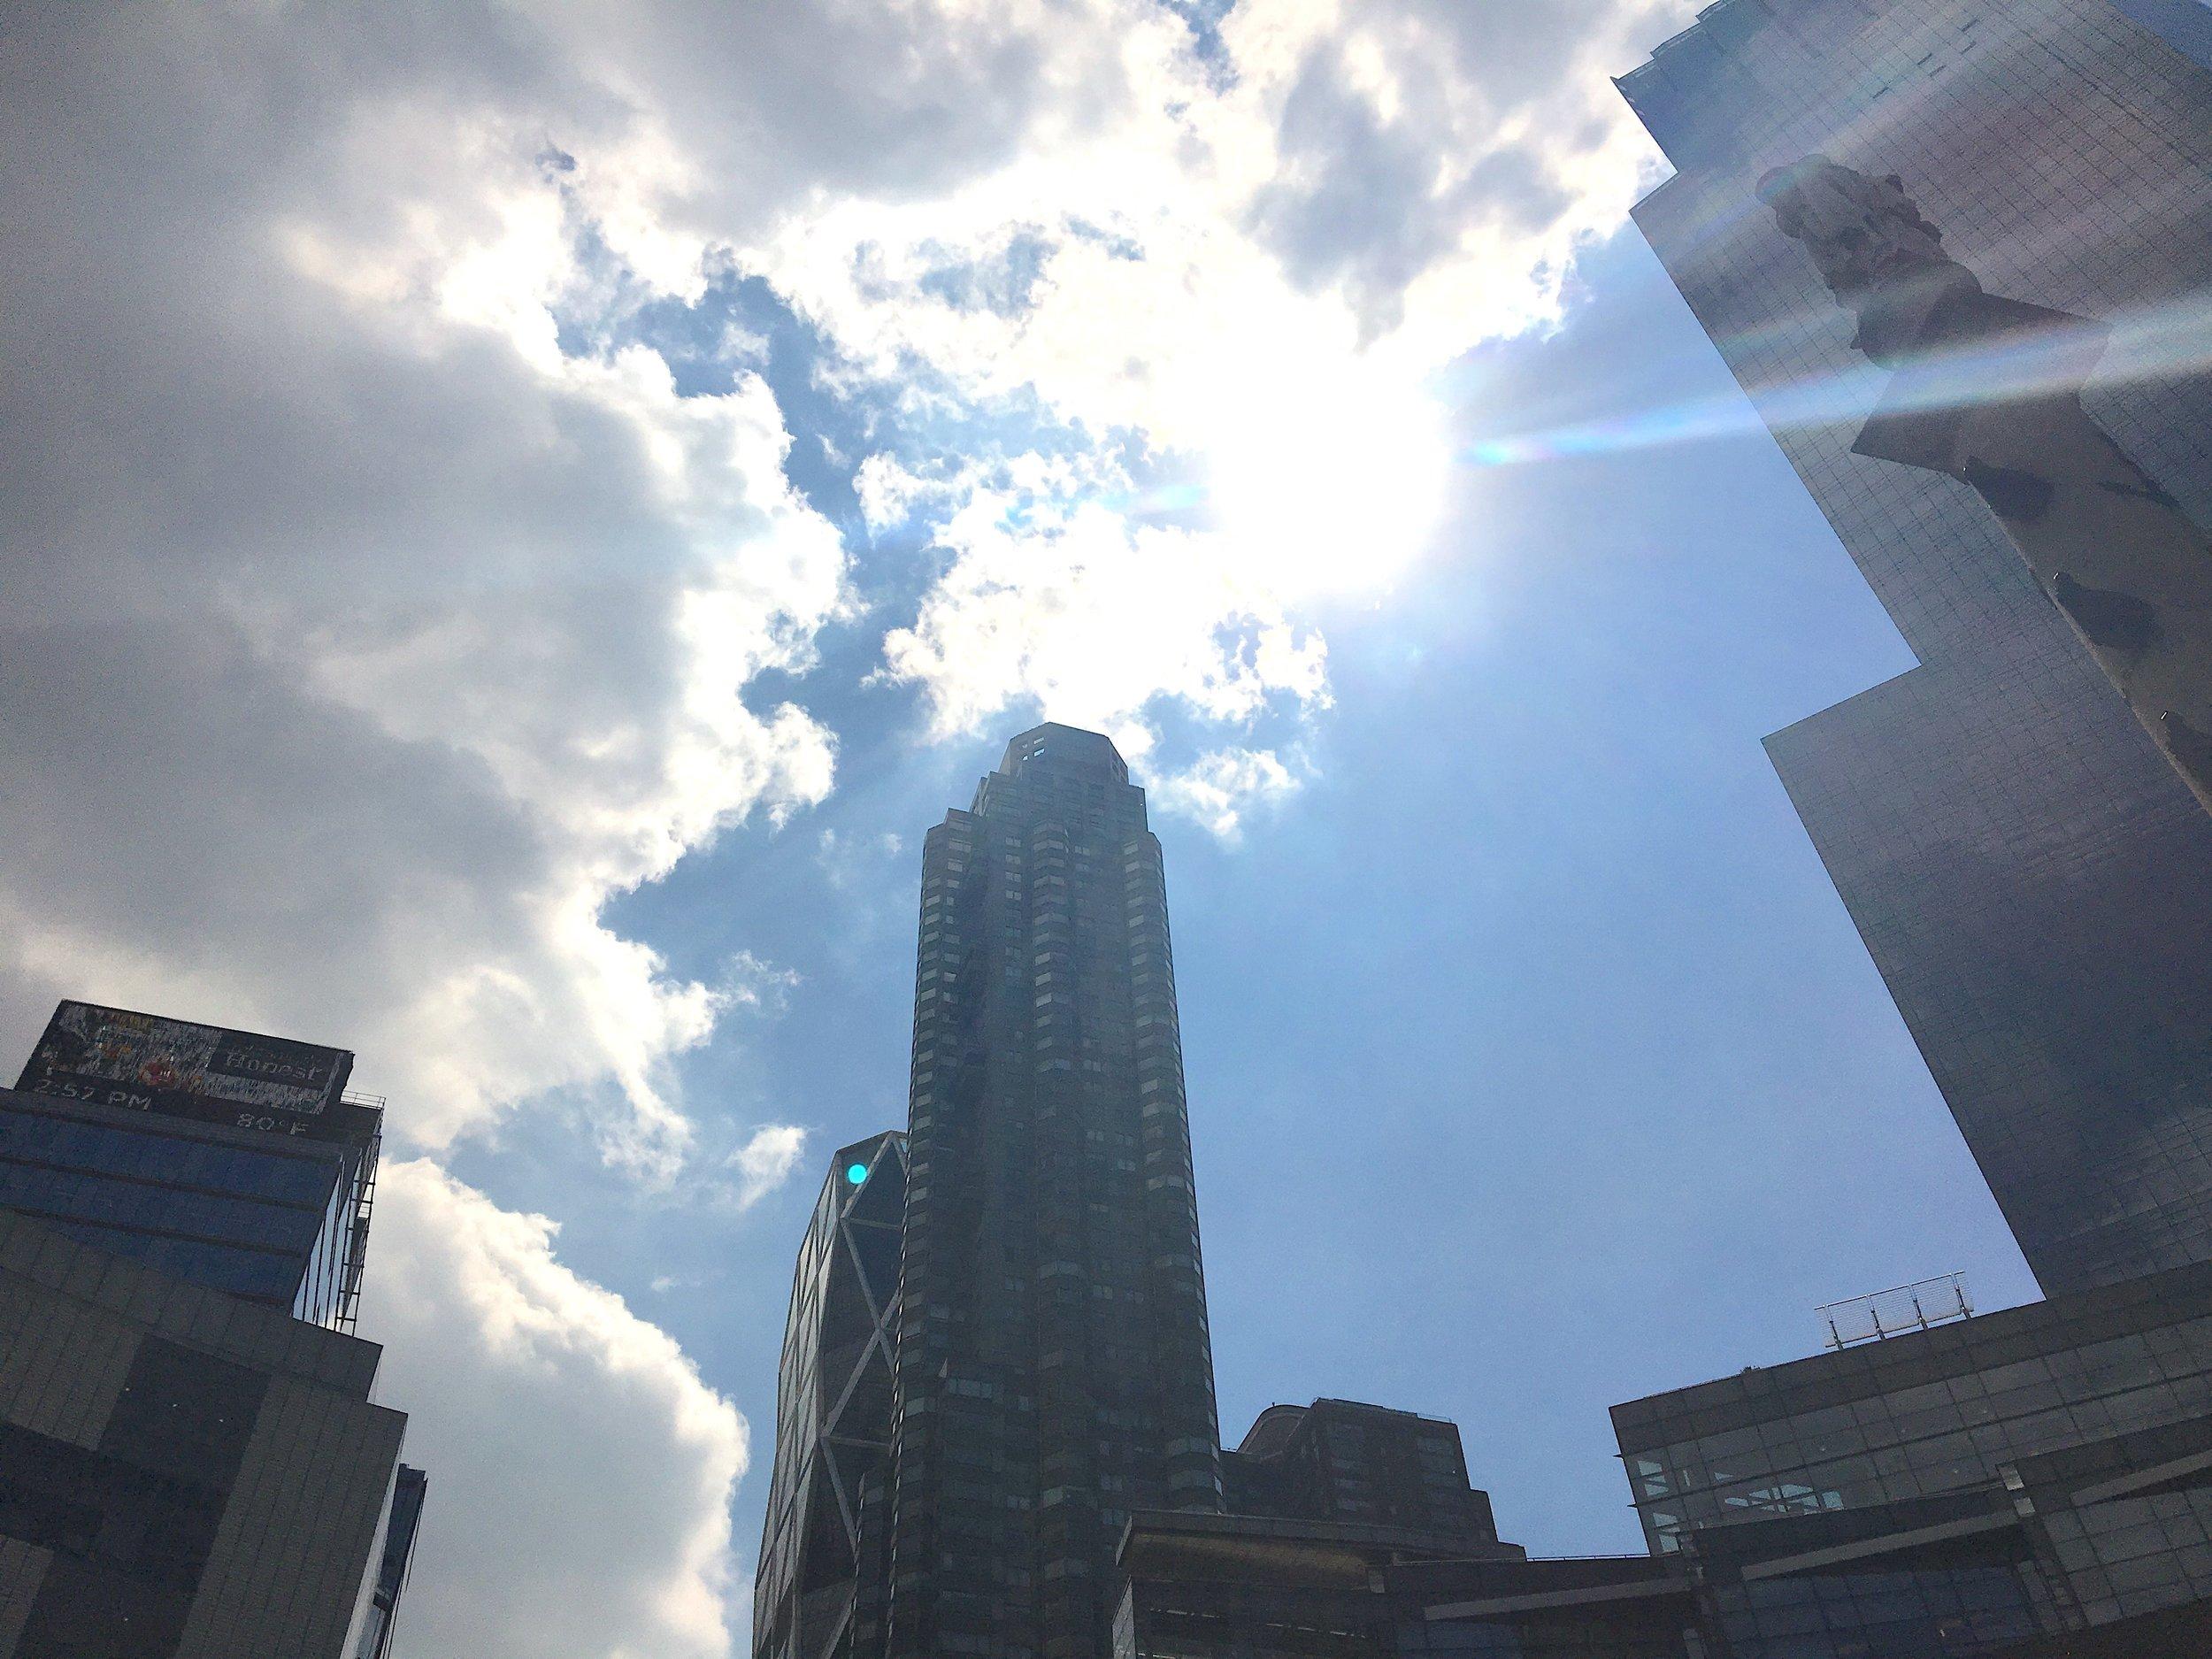 The valley at street level, Columbus Circle. New York City, June 2017. © Pamela Kerpius